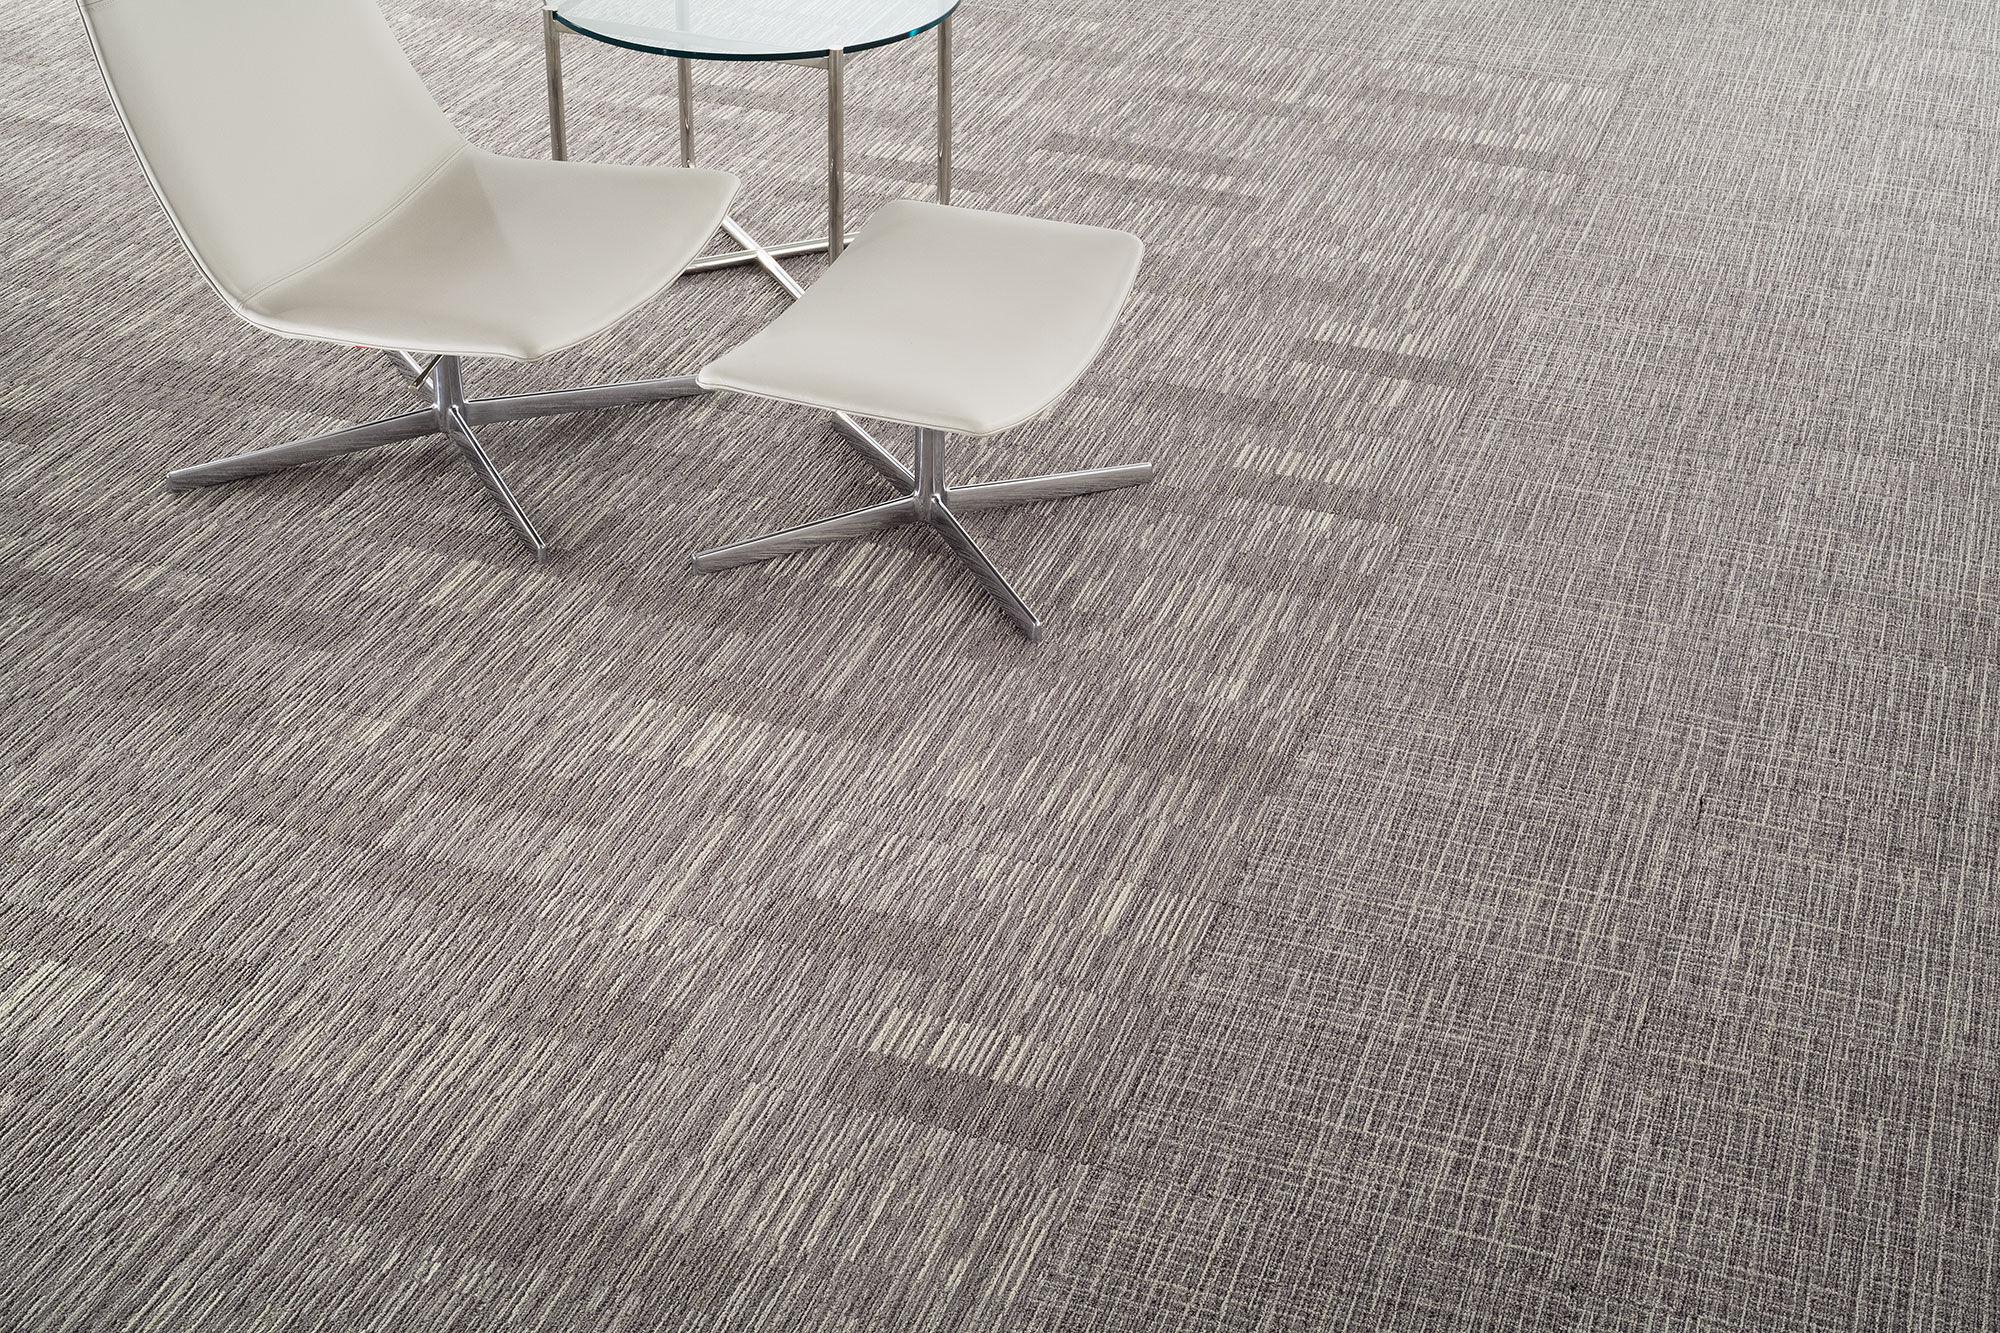 best carpet designs office carpet dubai across uae furniture trends and floor tiles pictures  best PIZEYCZ